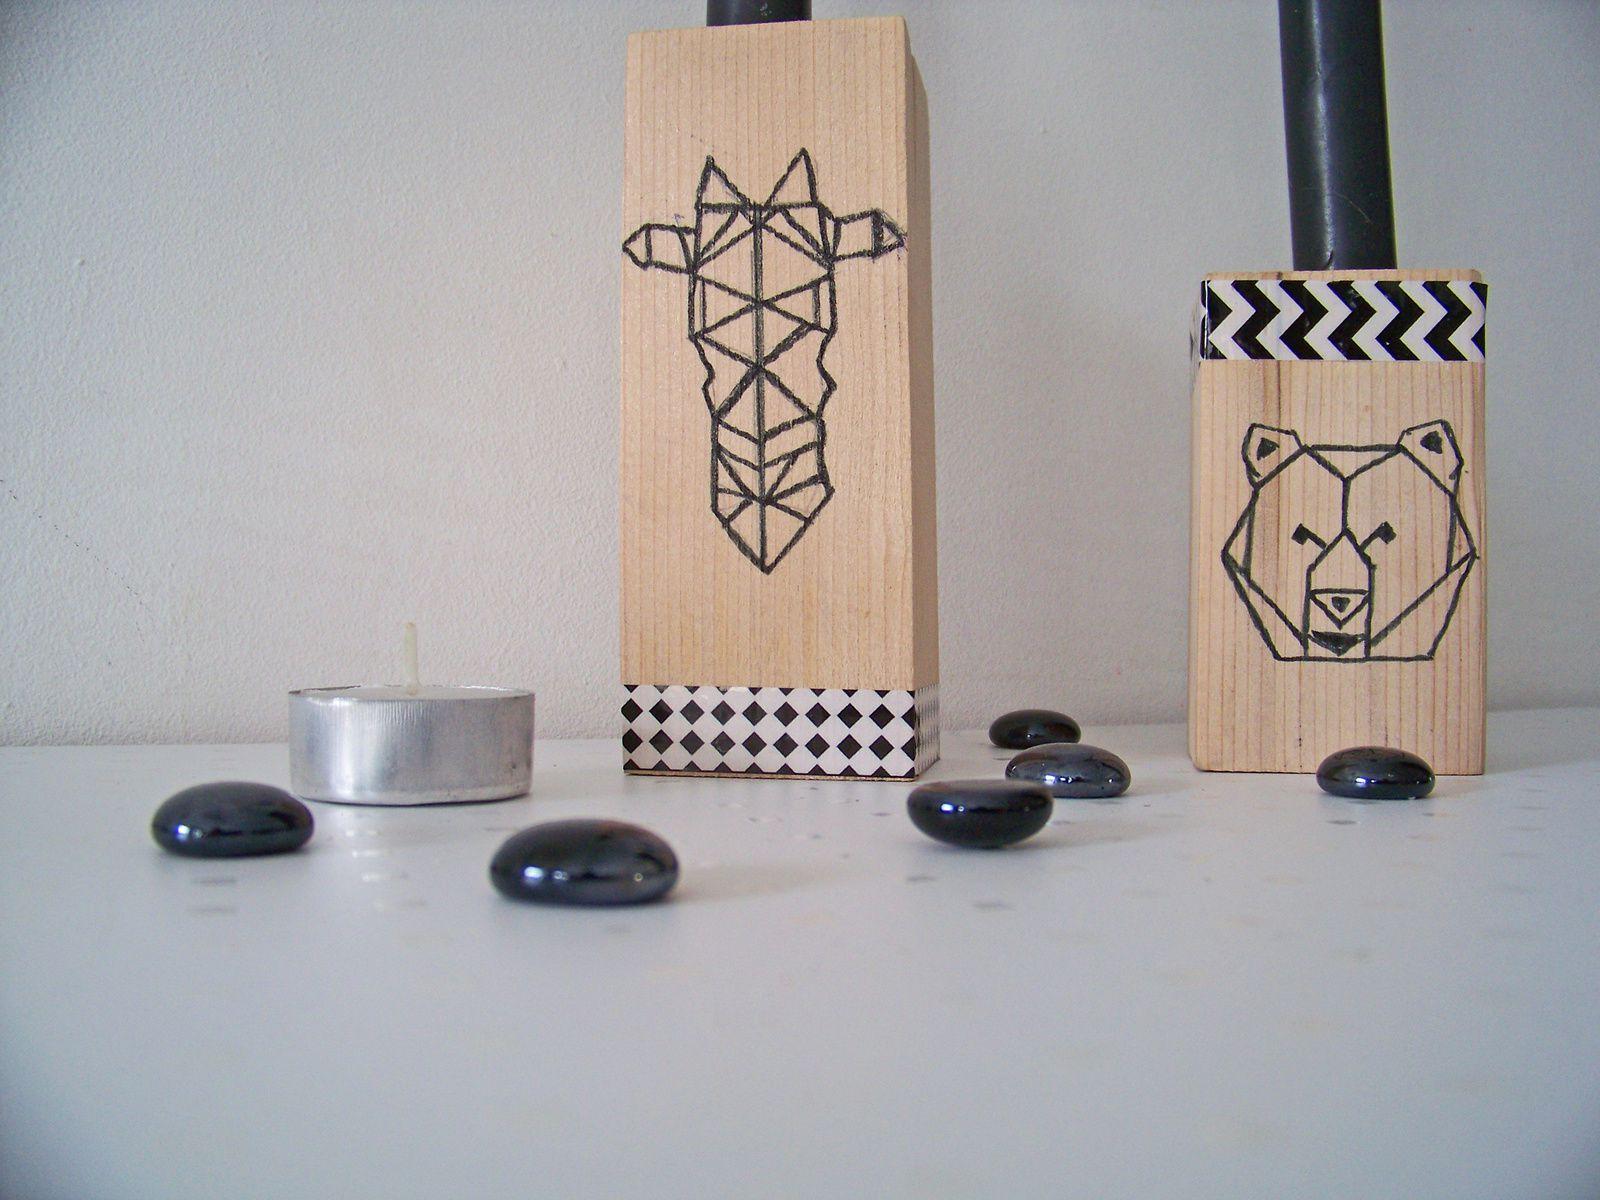 Motifs origami sur  bougeoirs en bois  !